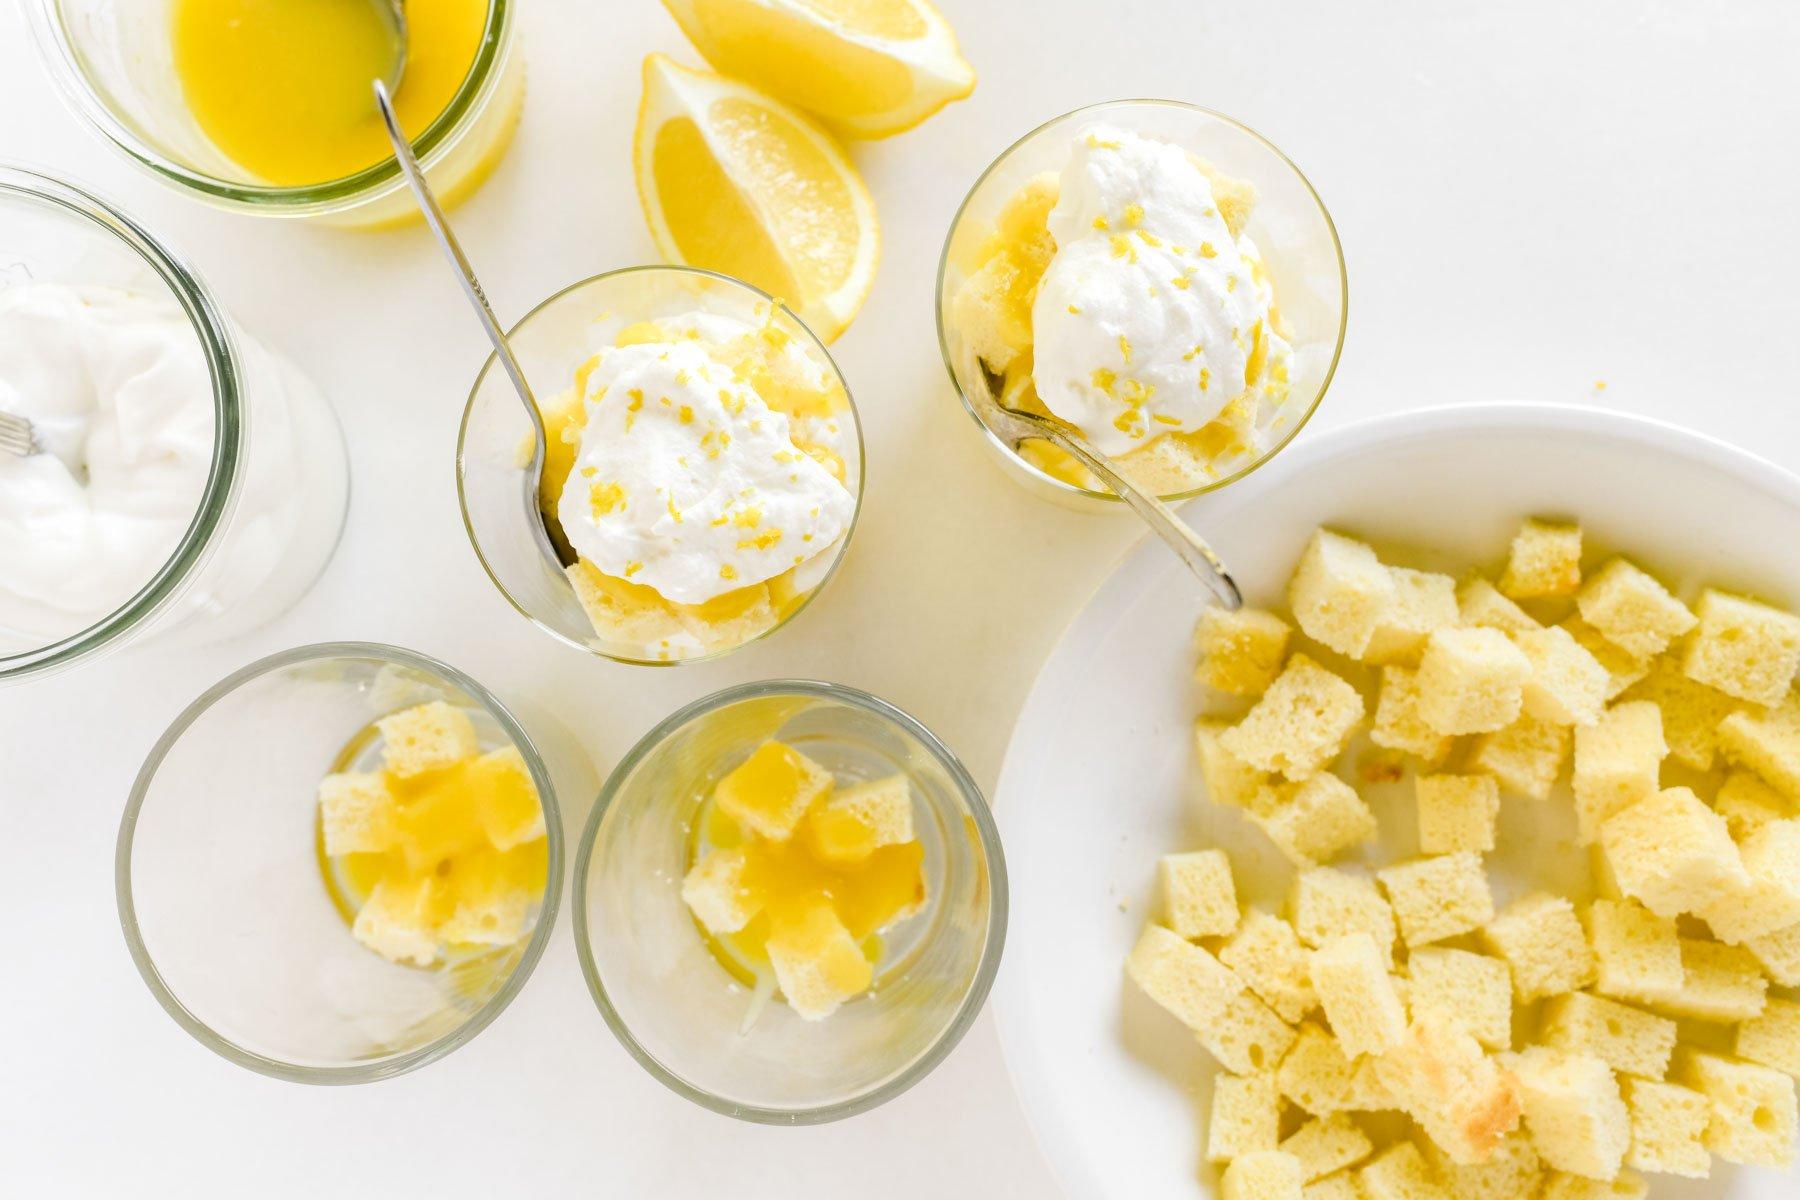 making lemon trifles